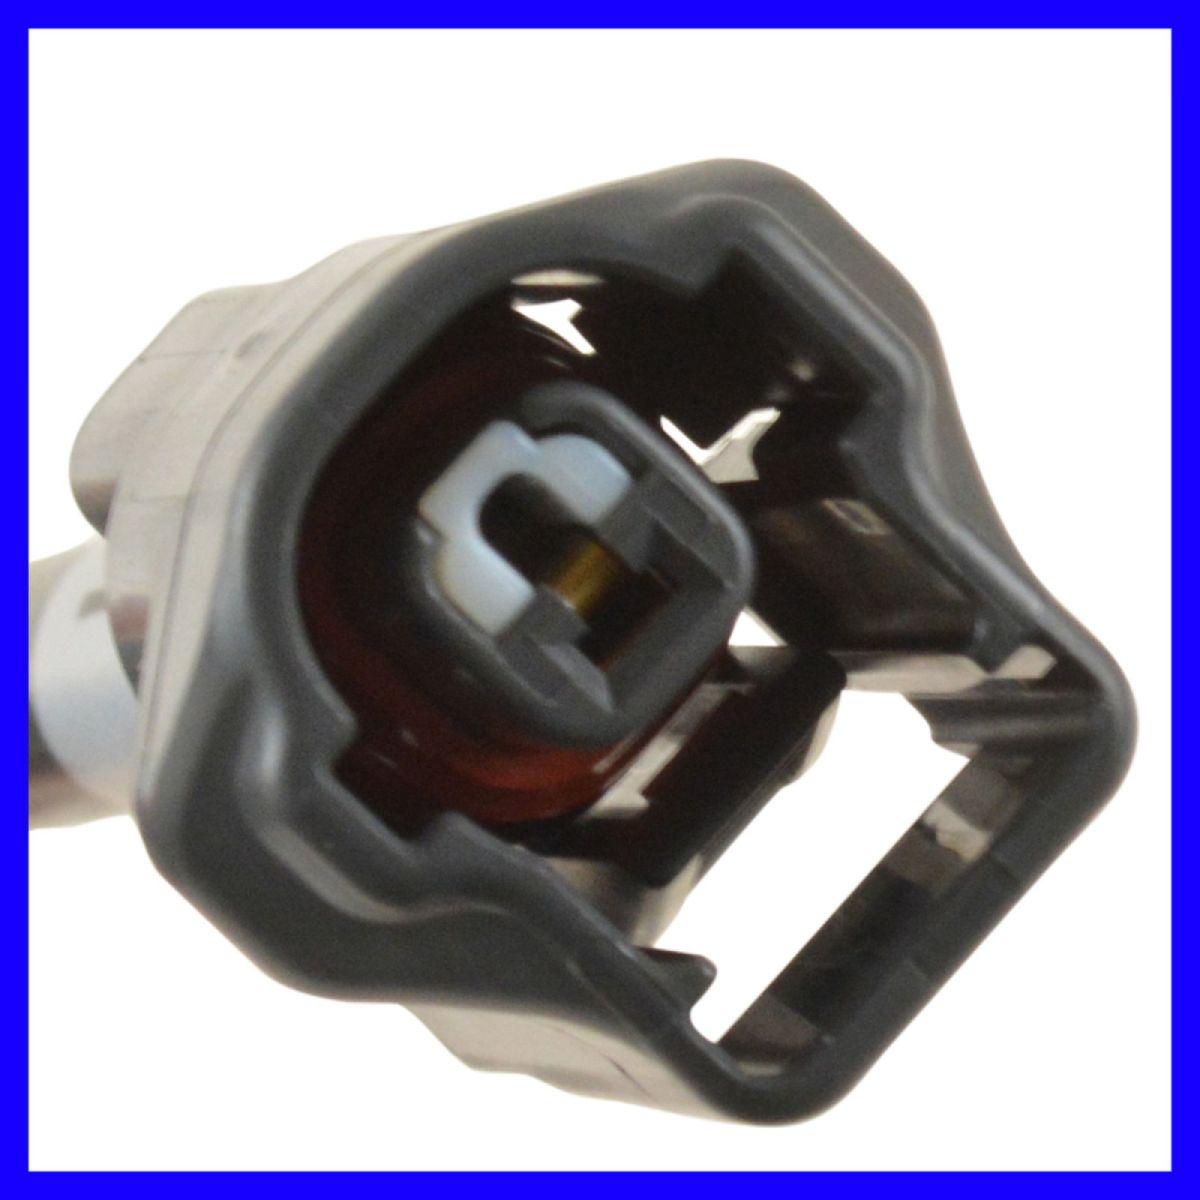 Oem Engine Knock Sensor Wiring Harness Pigtail Plug For 30 Toyota Lexus Rx300 Back Diagram